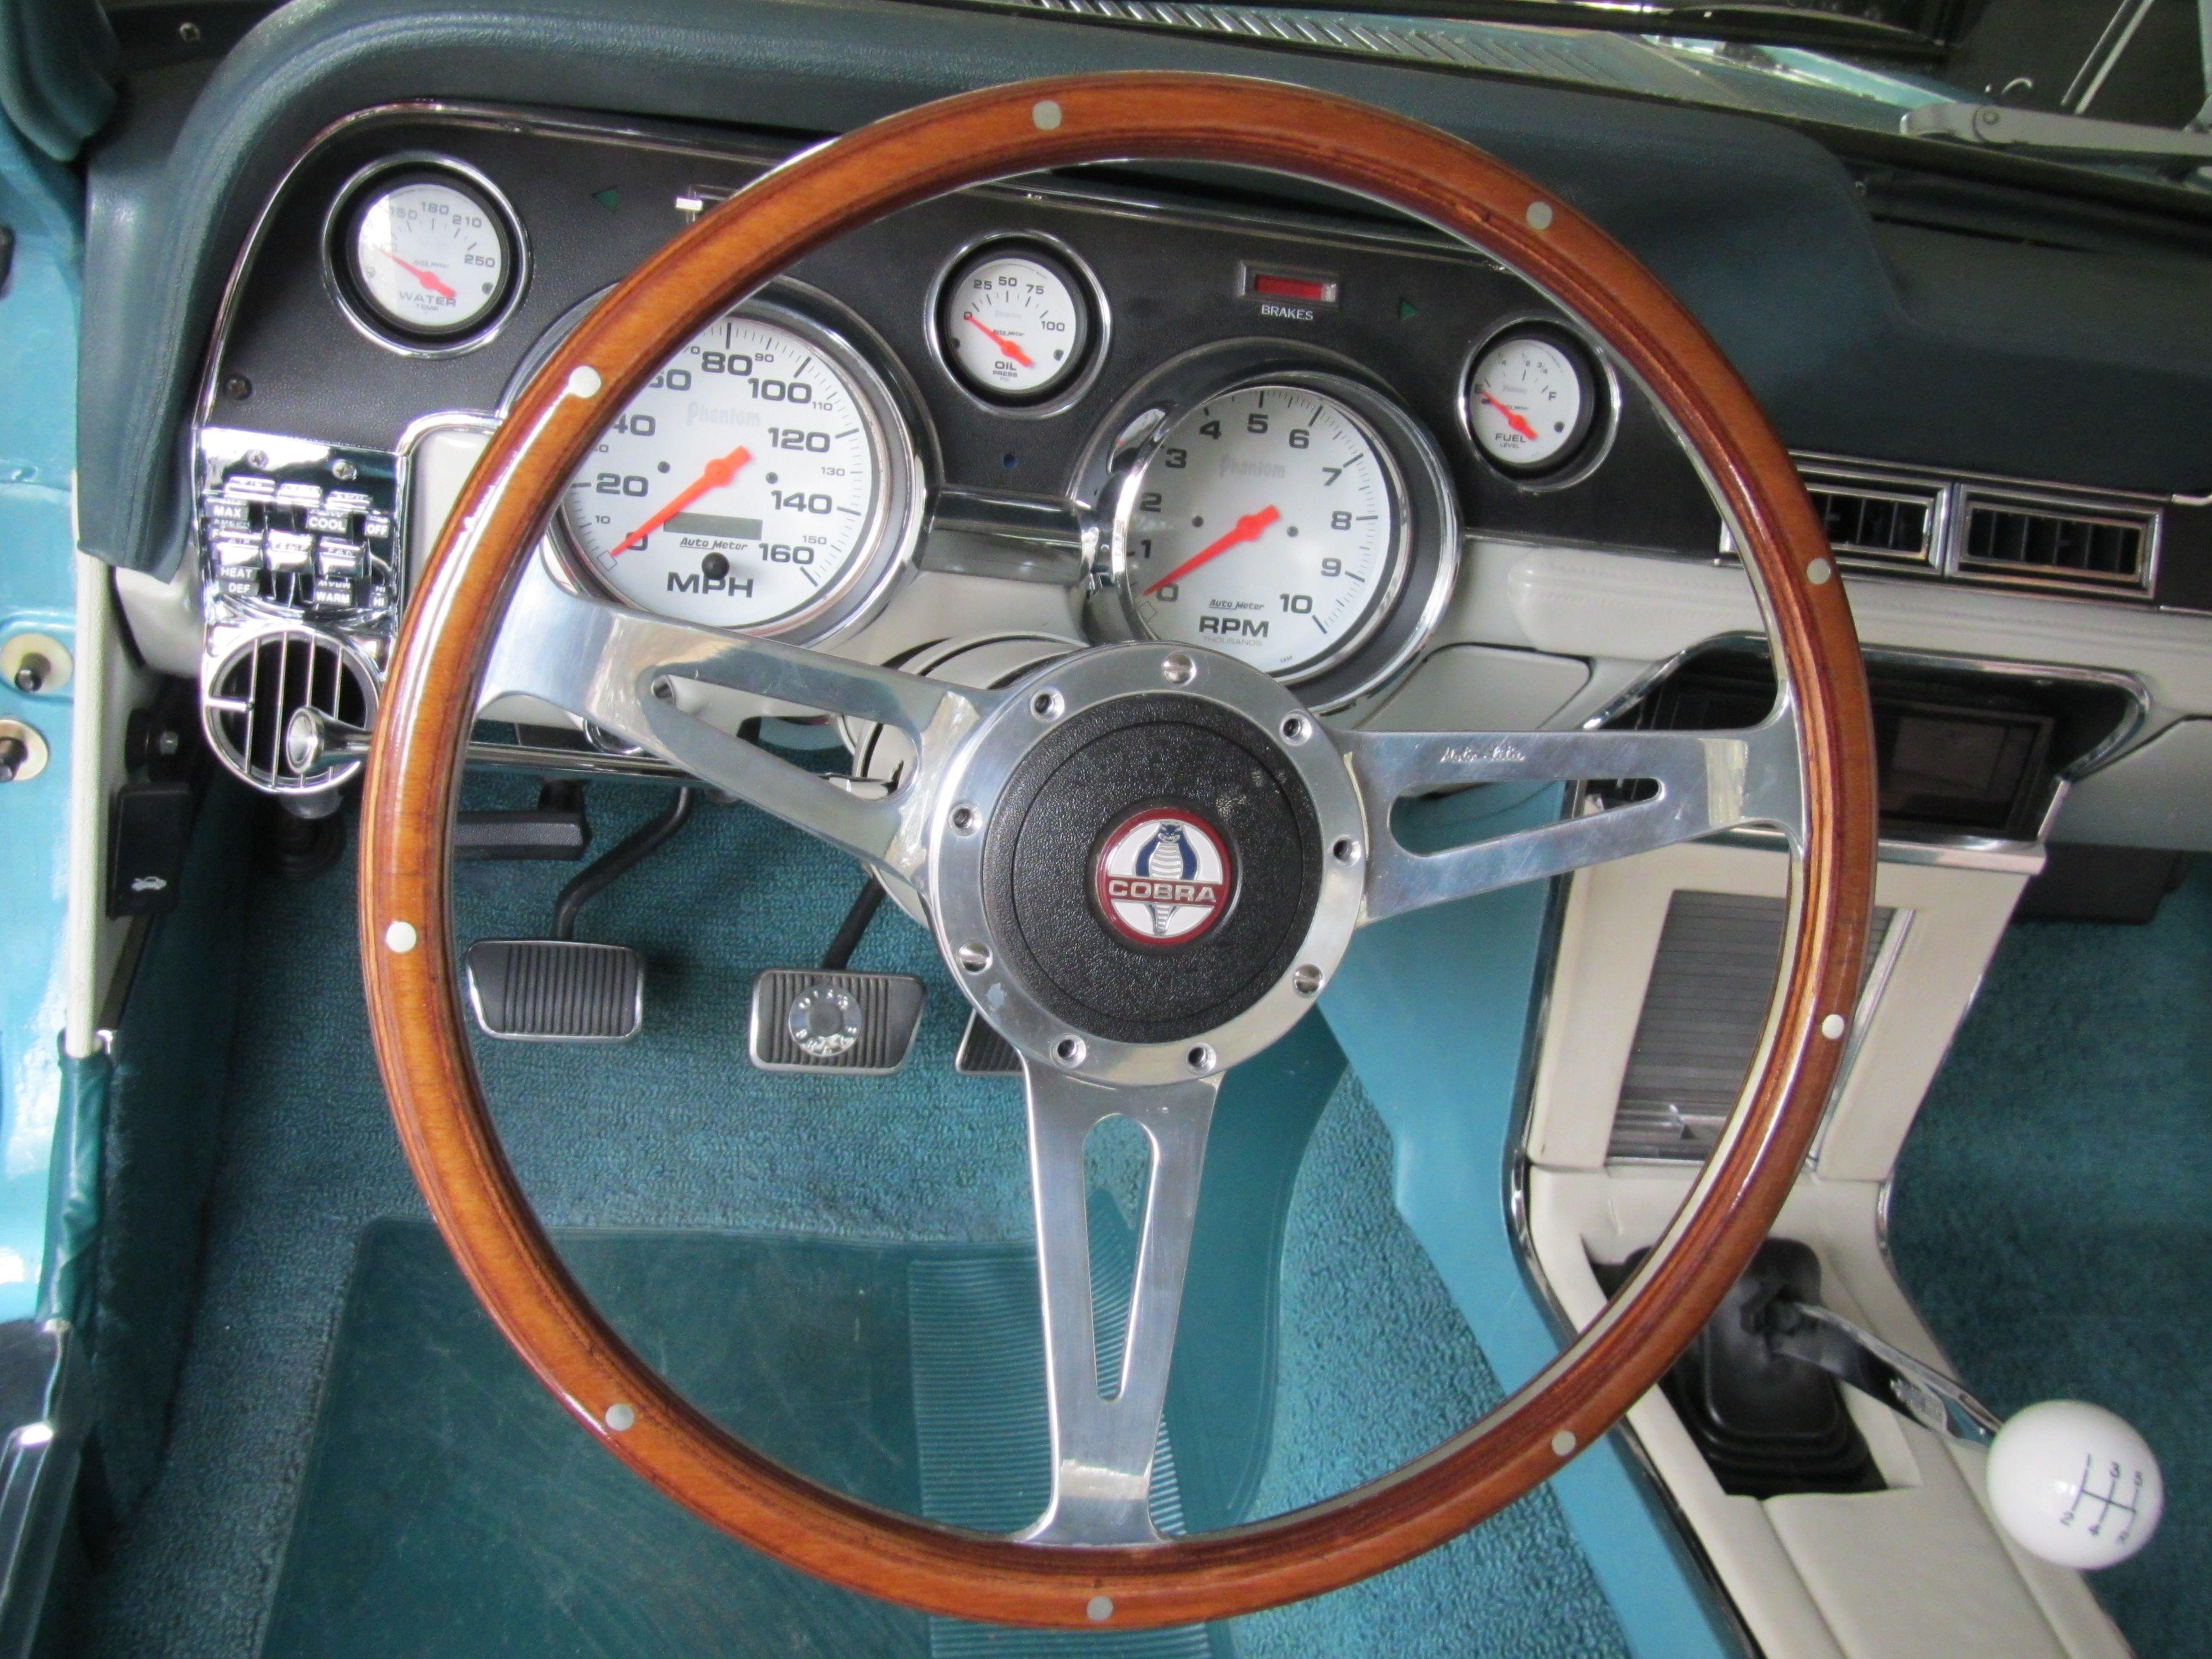 1967 Mustang Steering Wheel Mustang Interior Lovely Car Mustang